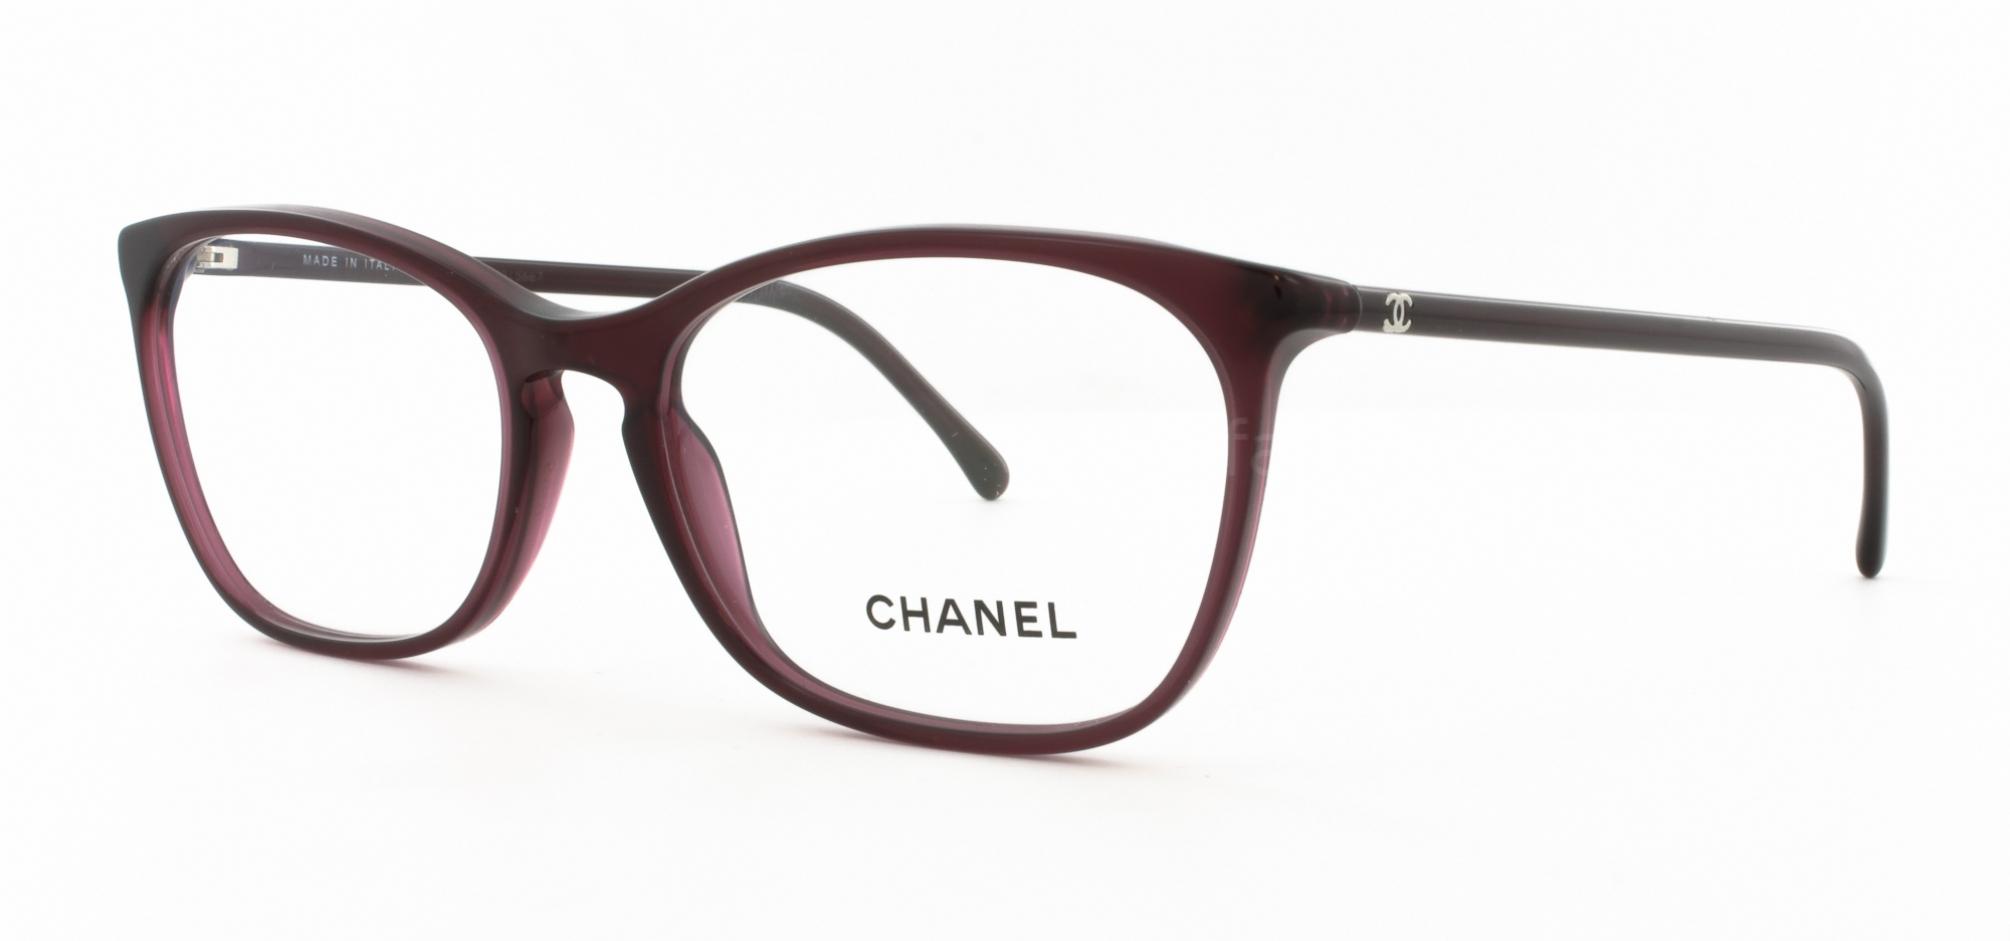 chanel 3281 eyeglasses